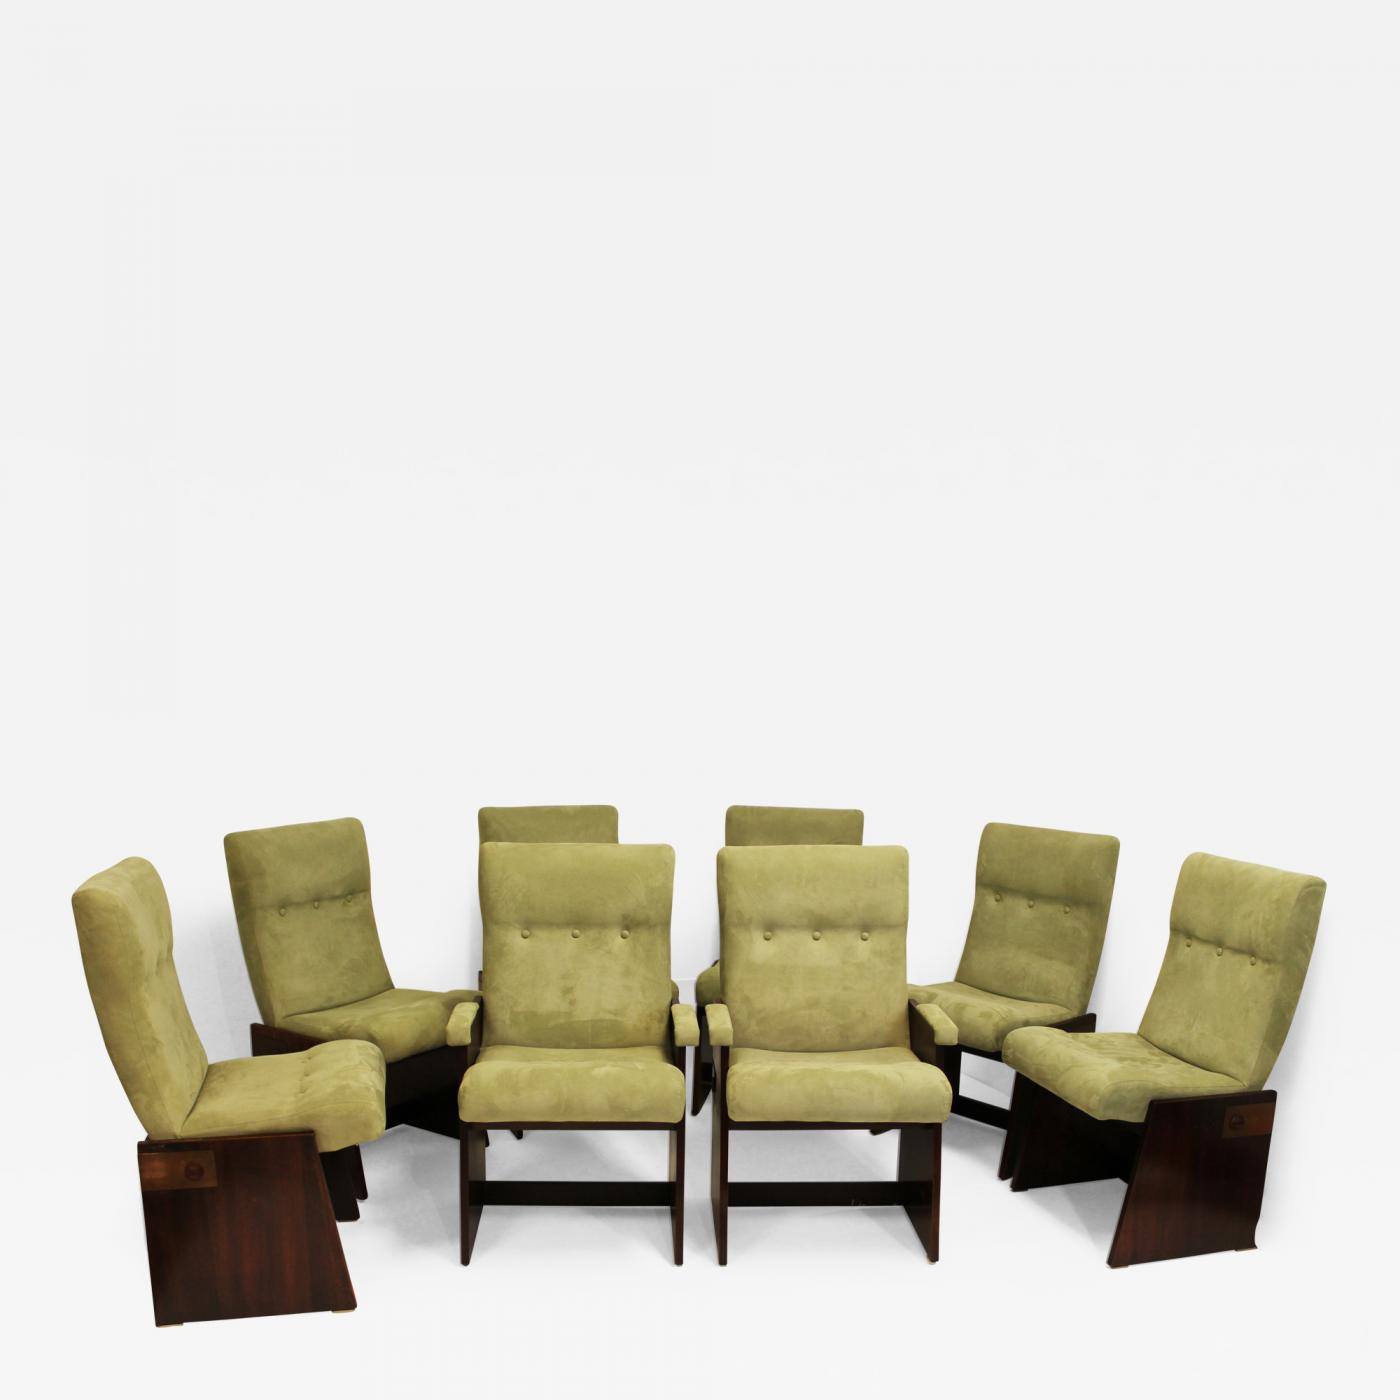 Brutalist Furniture Home Design Ideas and